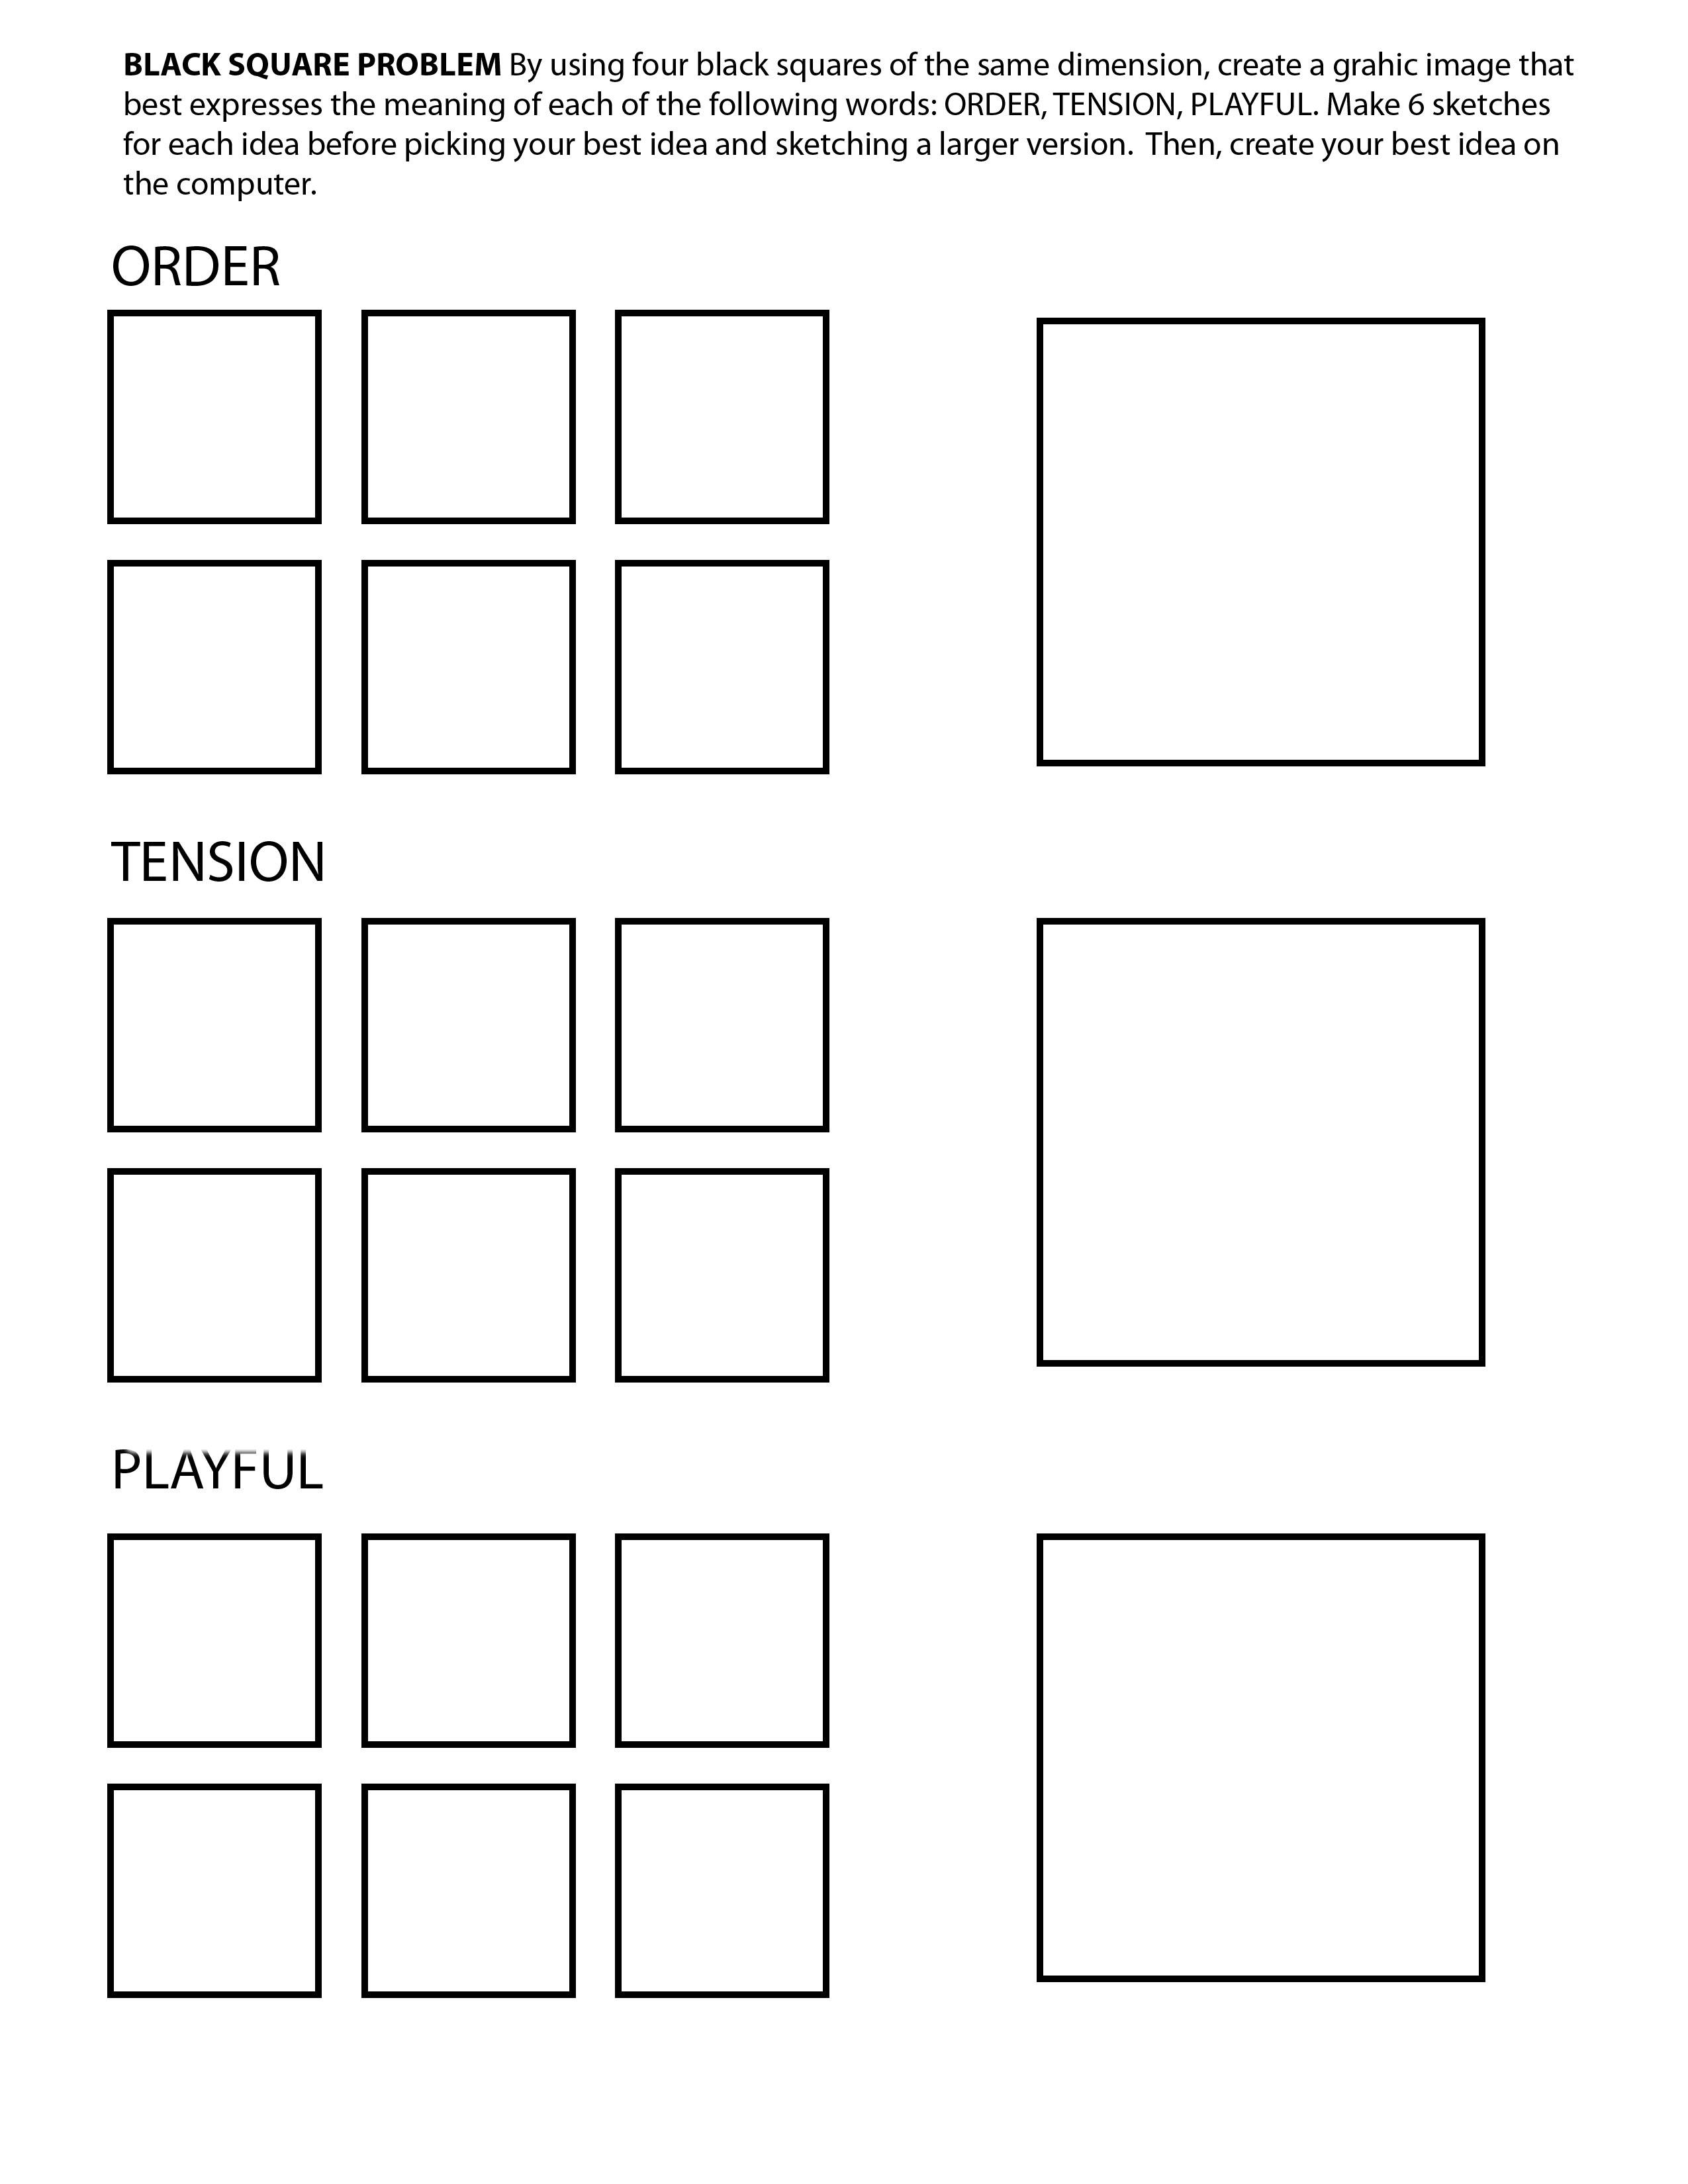 Assignment 4 Black Square Problem